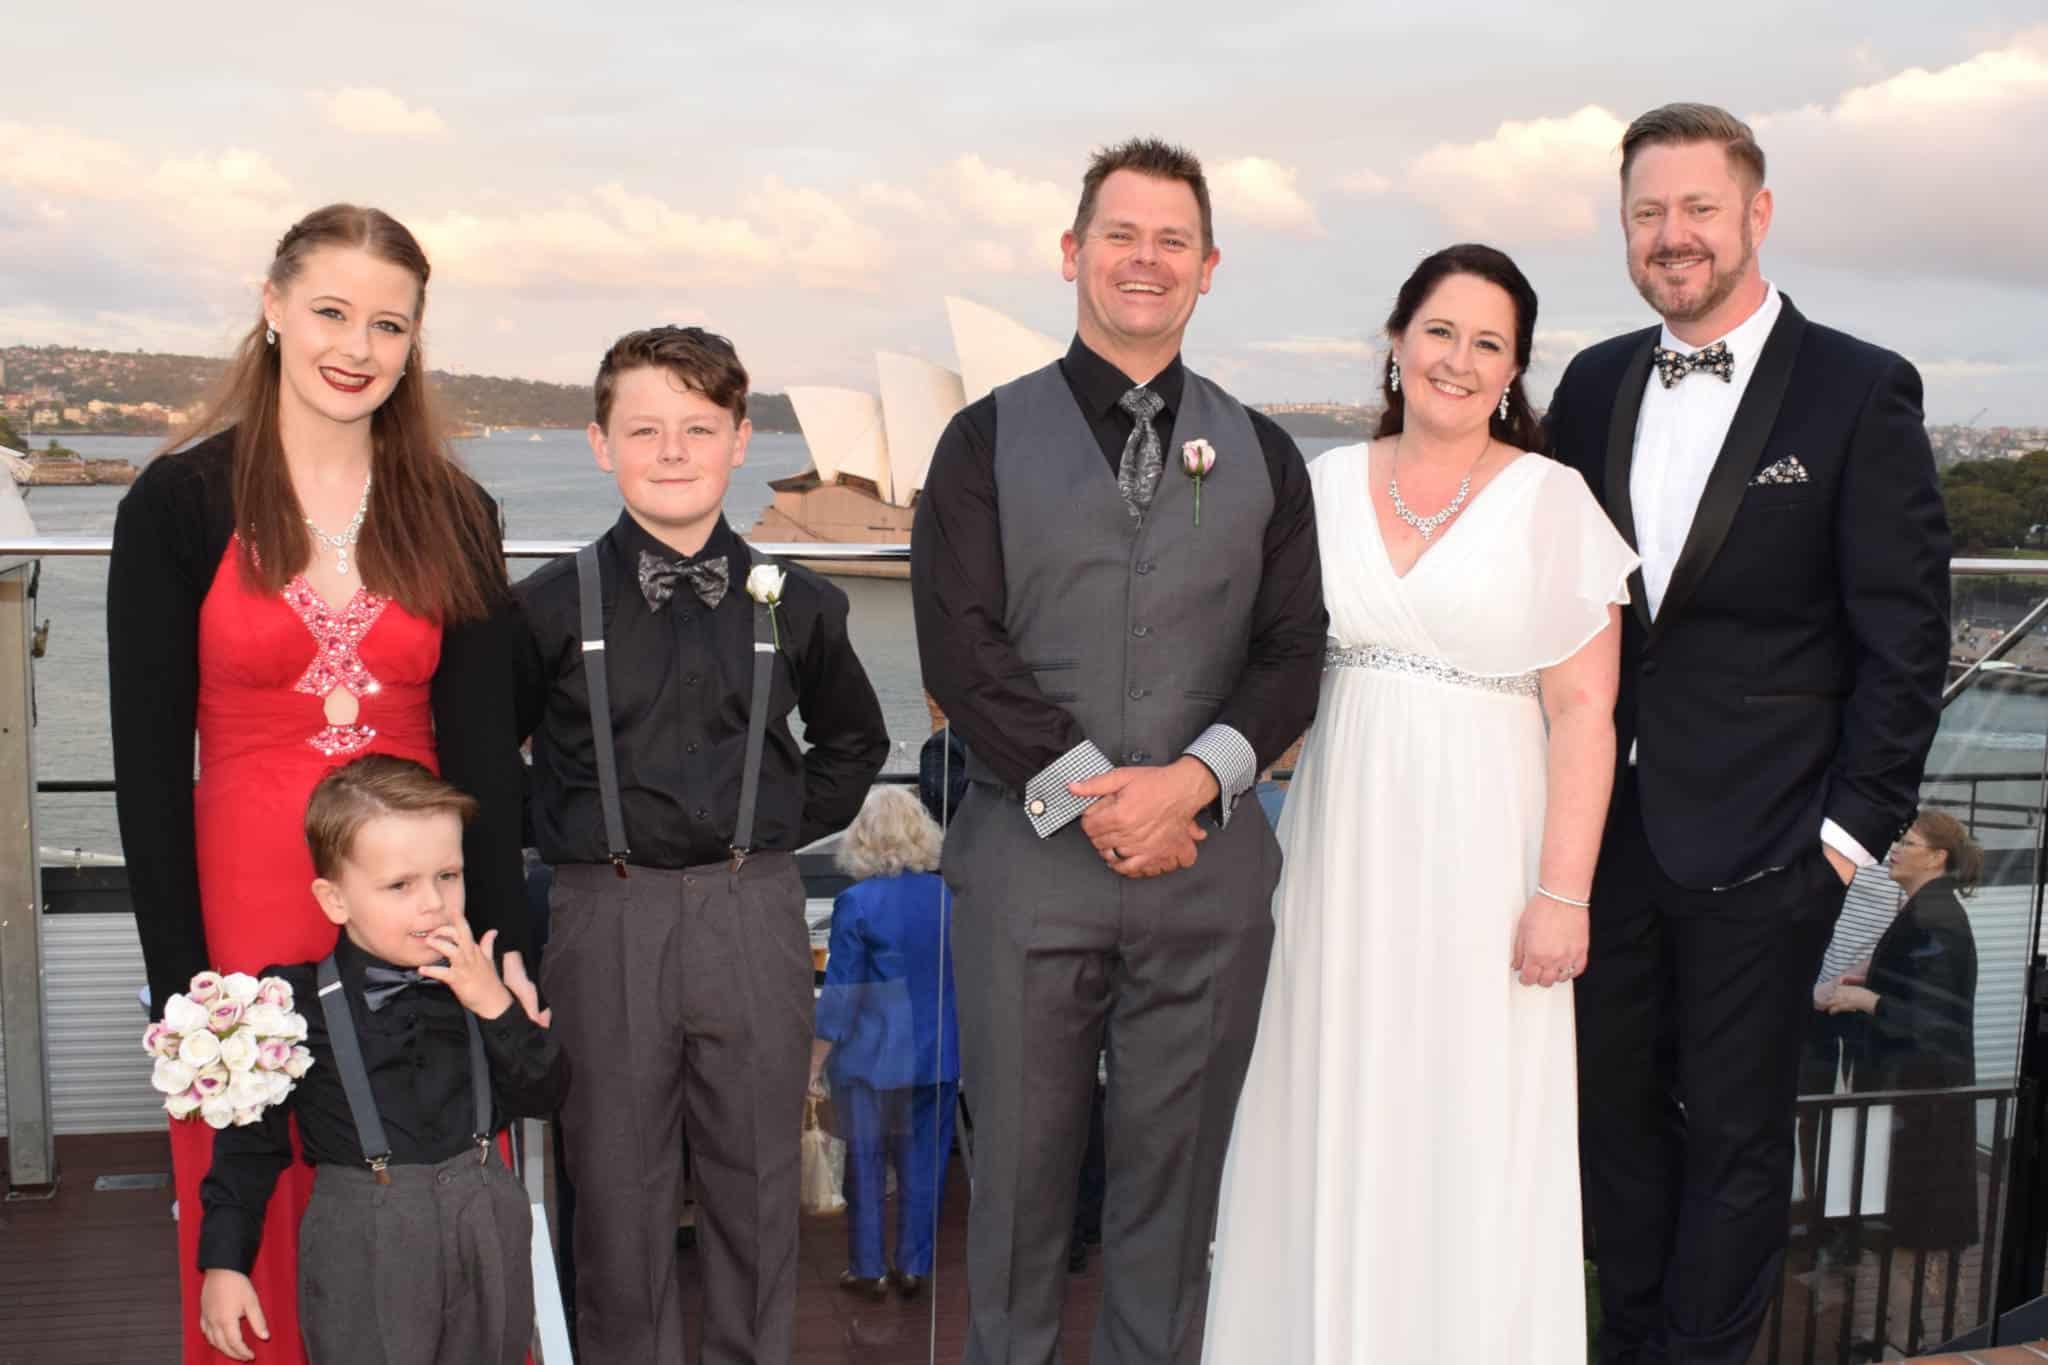 Family Wedding - Marriage Celebrant Sydney Stephen Lee